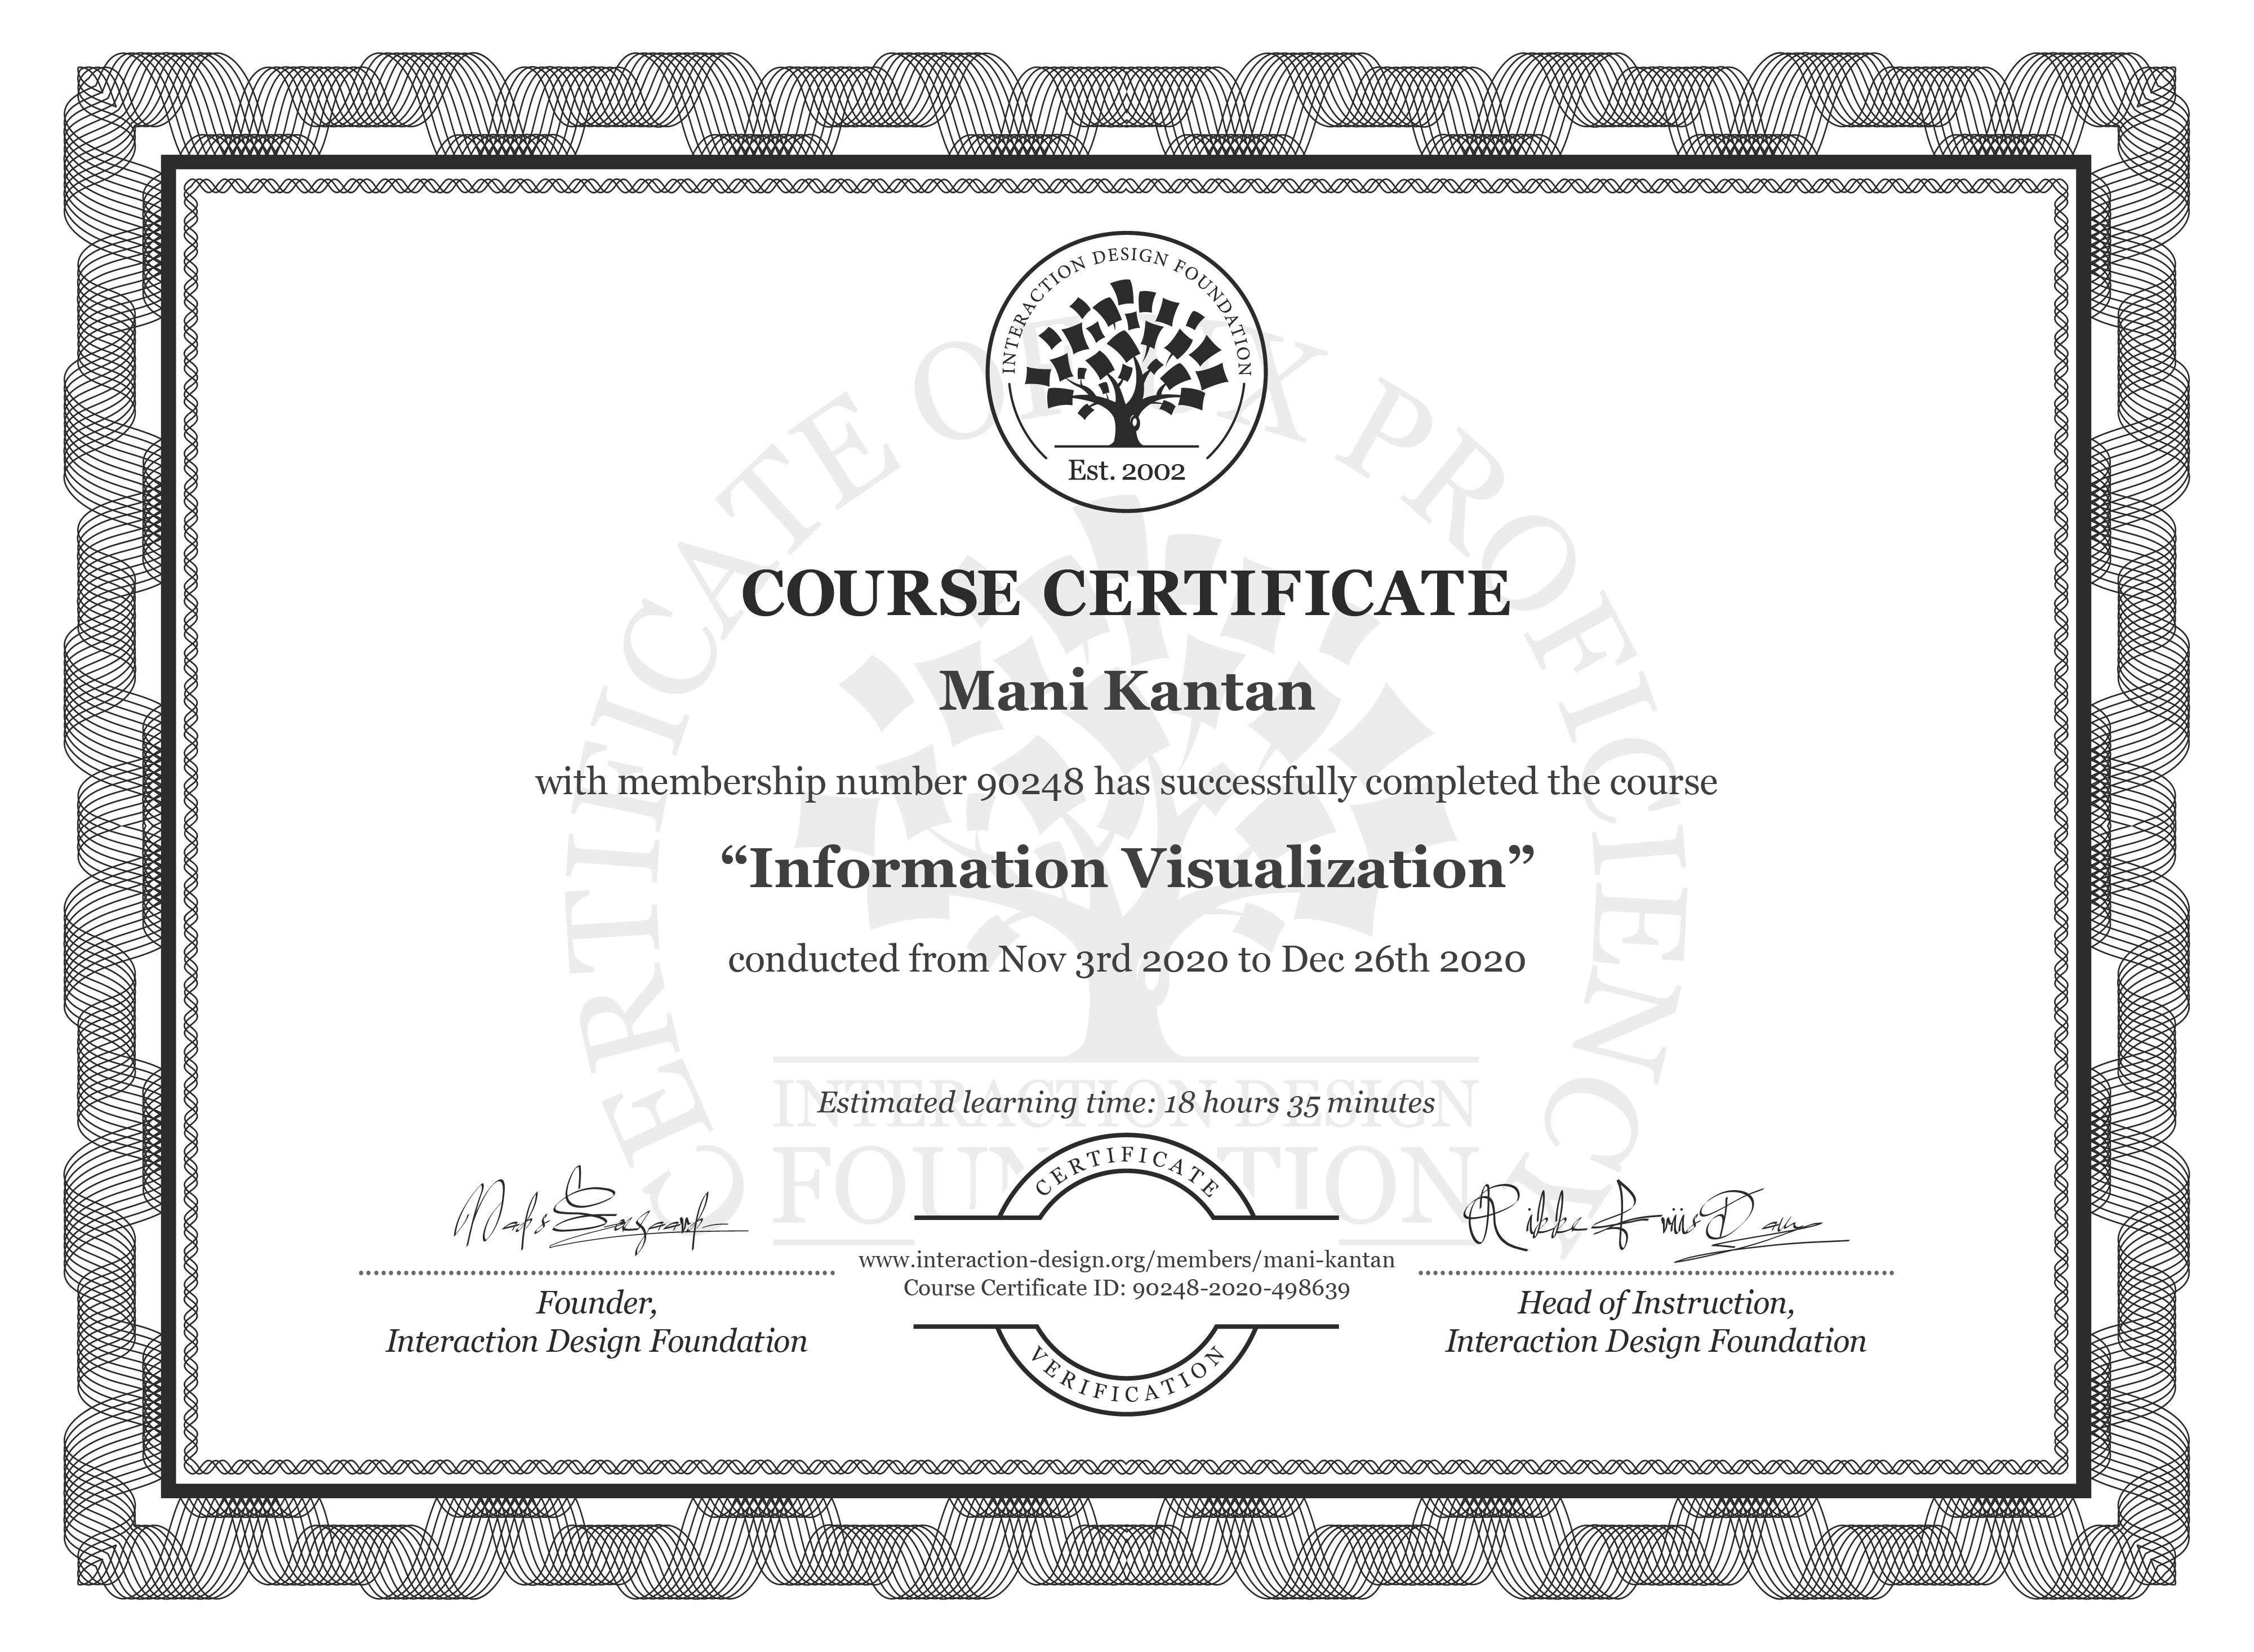 Mani Kantan's Course Certificate: Information Visualization